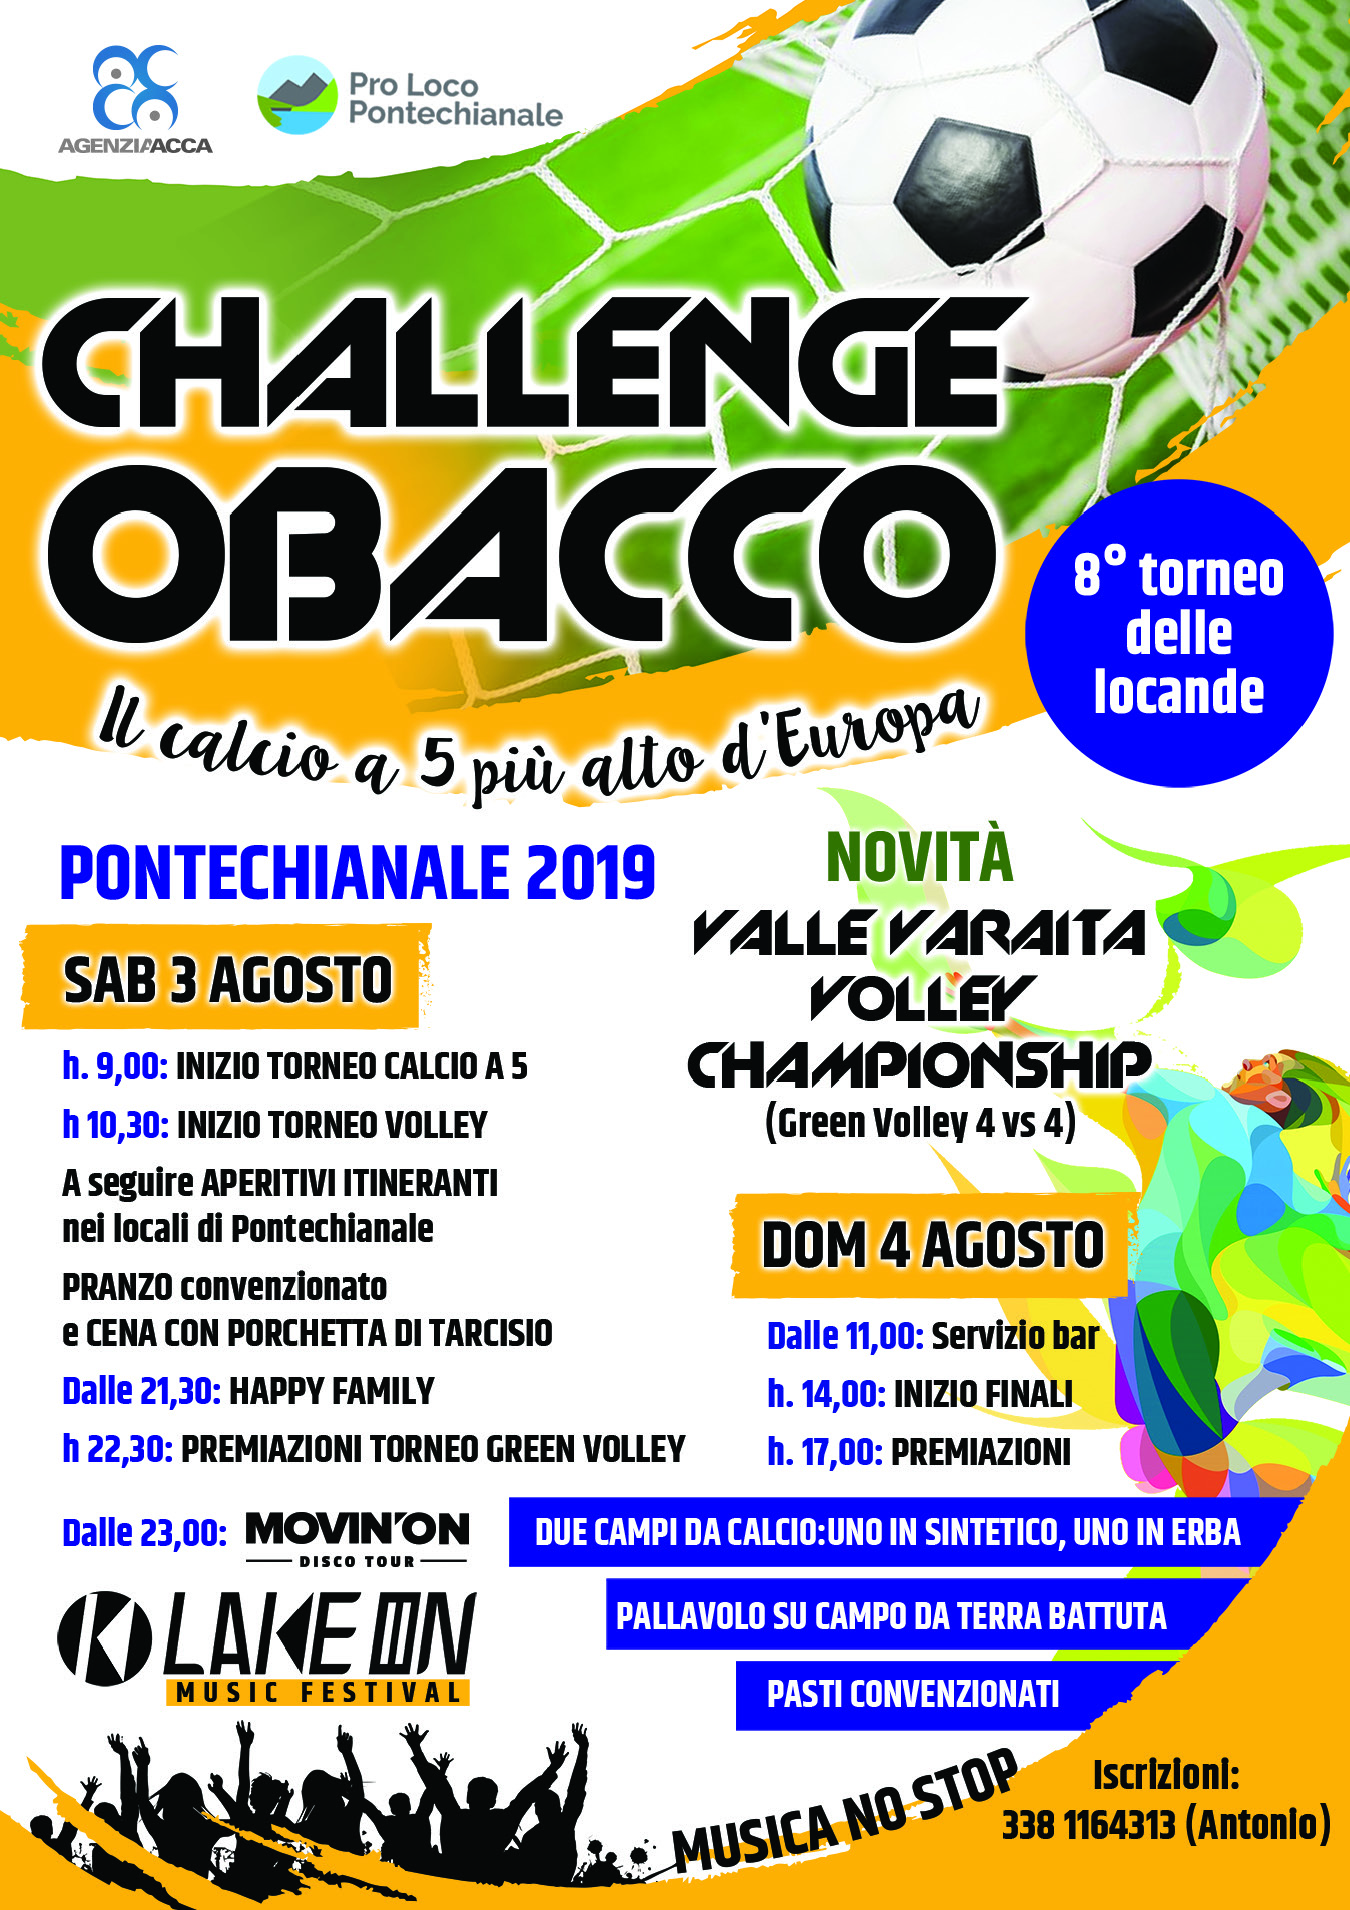 Challenge Obacco